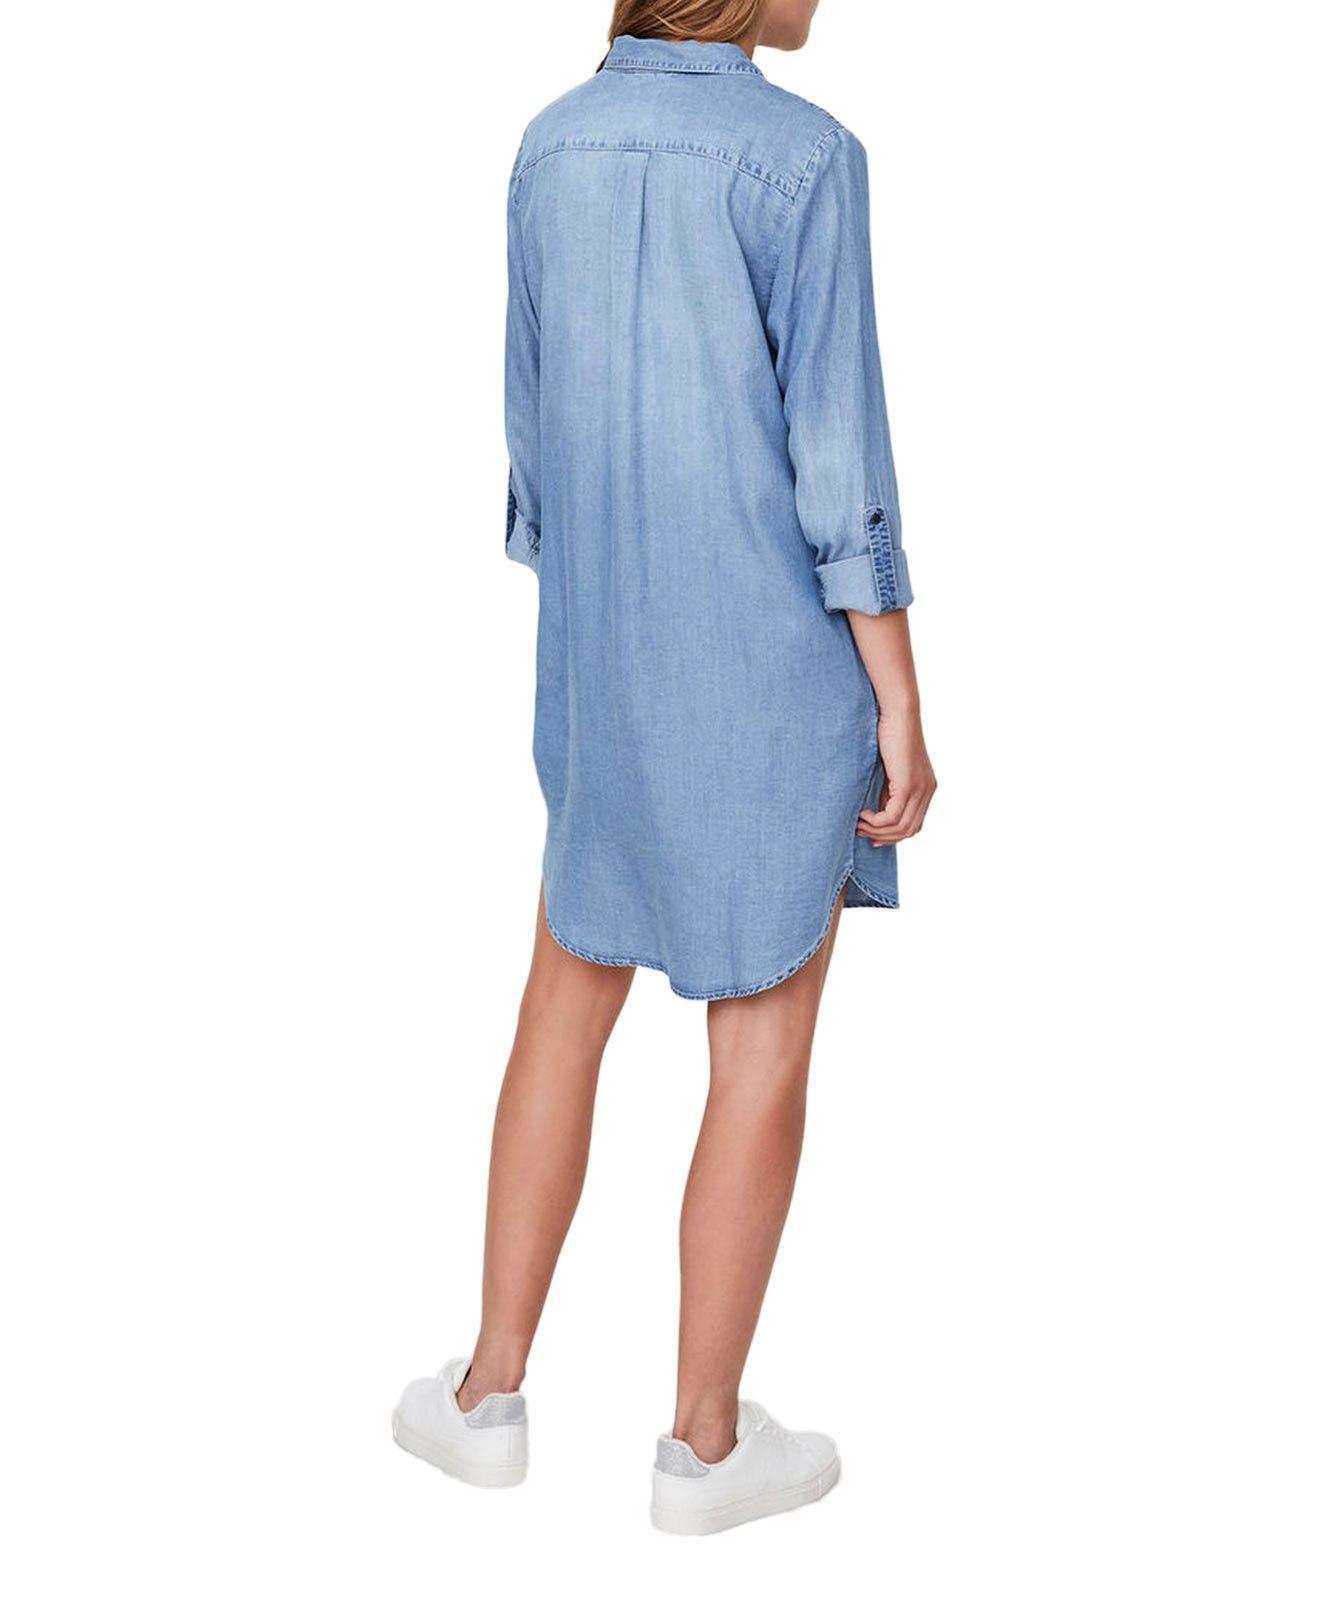 Vero Moda Jeanskleid Silla In Hellblauem Light Blue Denim